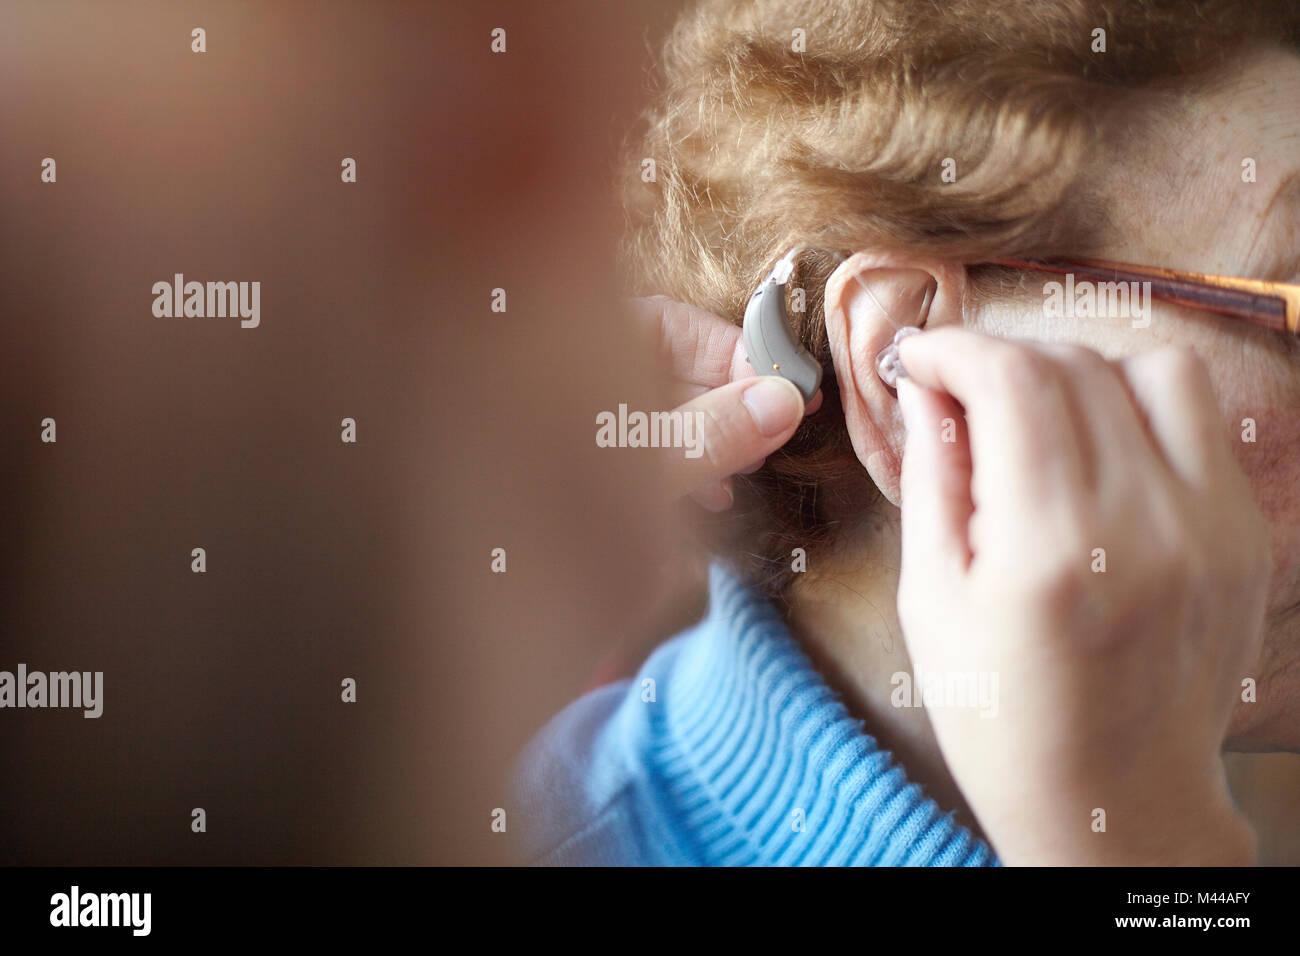 Mujer madura, ayudando a altos mujer insertar audífonos, cerrar, enfoque diferencial Foto de stock